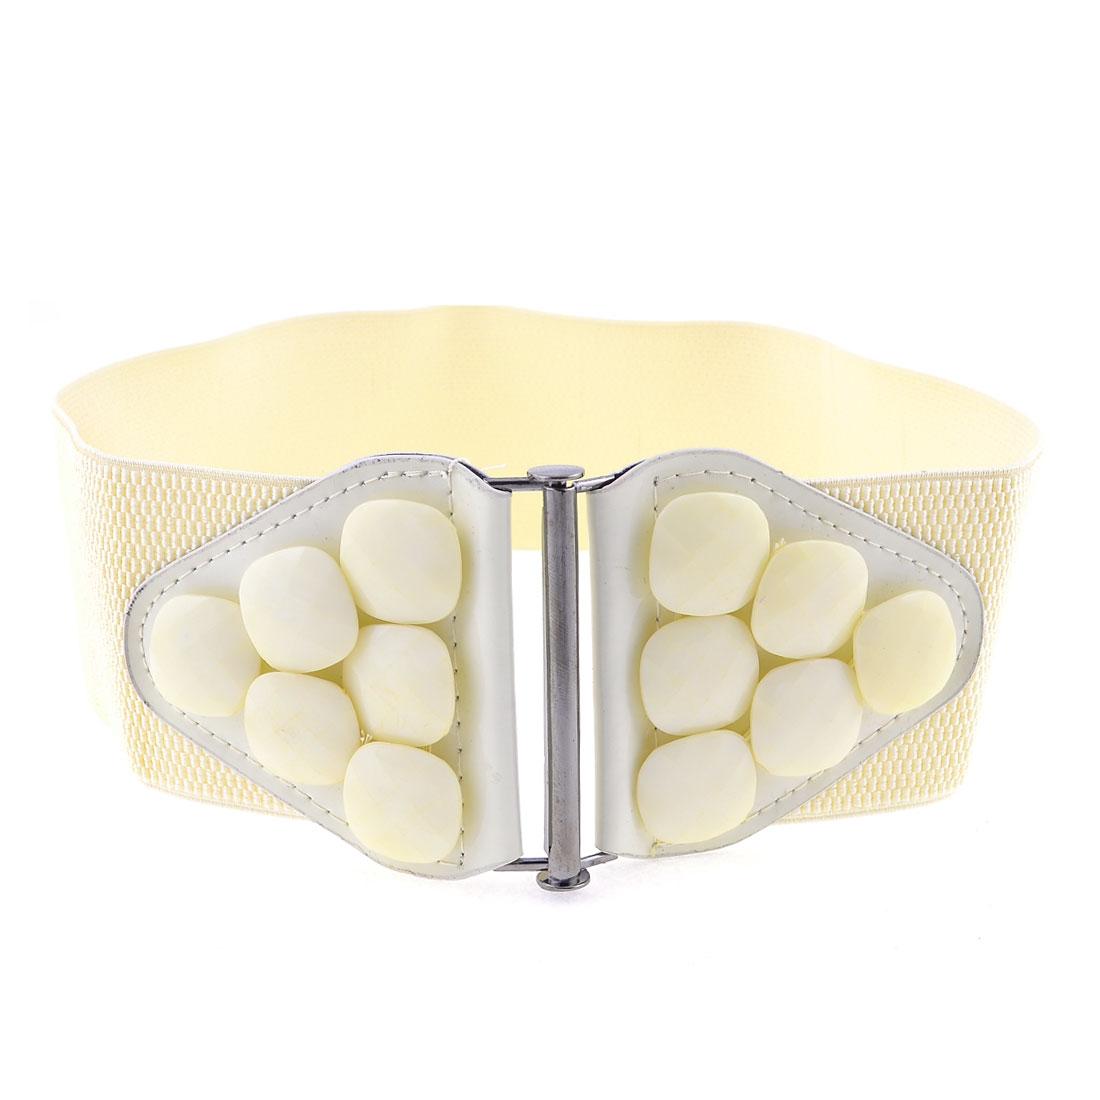 Lady Beads Decor Interlocking Buckle Strentch Waist Cinch Belt Waistbelt Off White